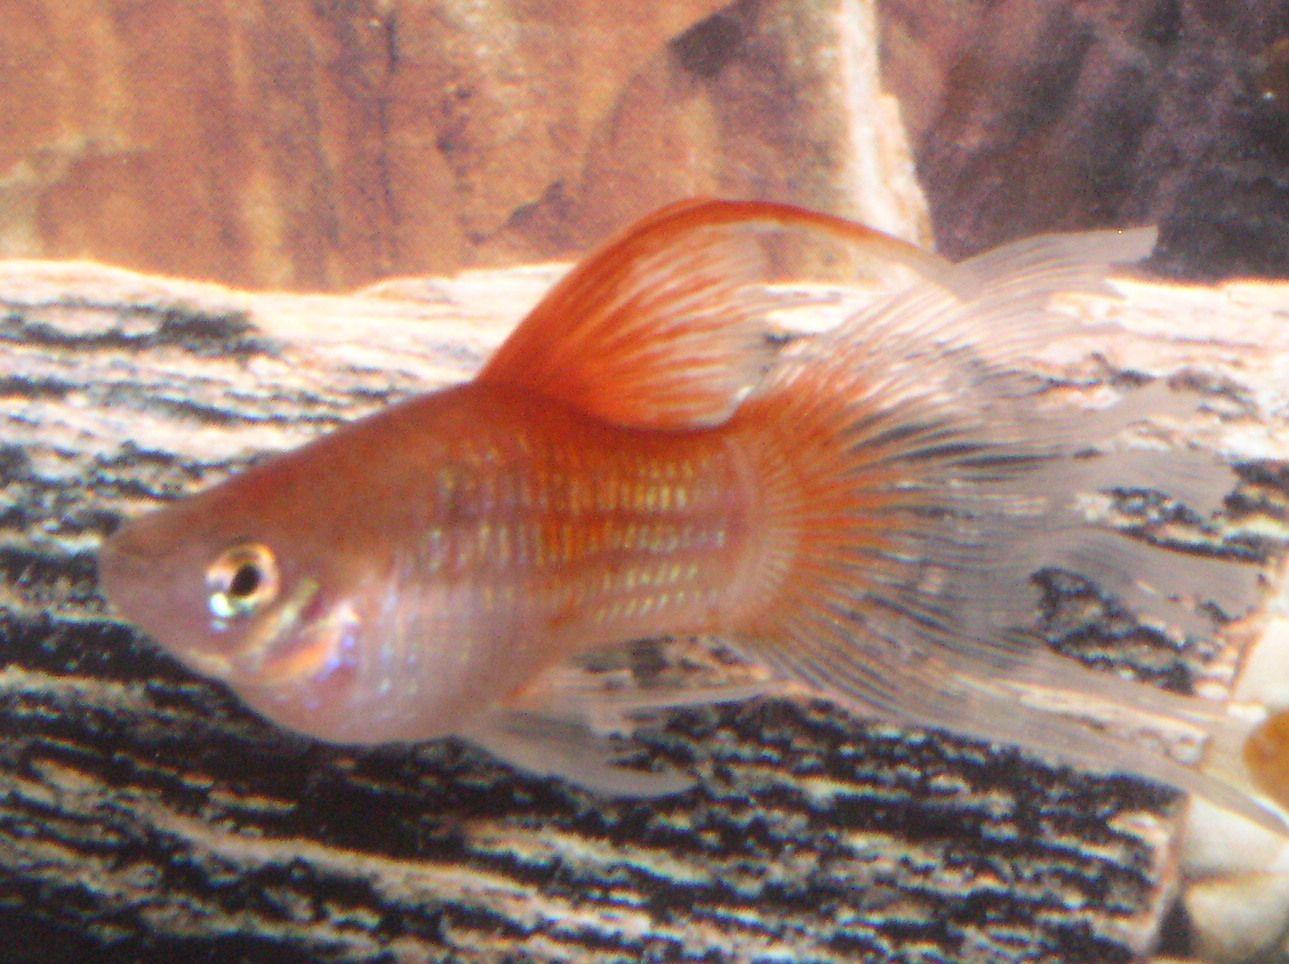 Ugly freshwater aquarium fish - Explore Freshwater Aquarium Aquarium Fish And More